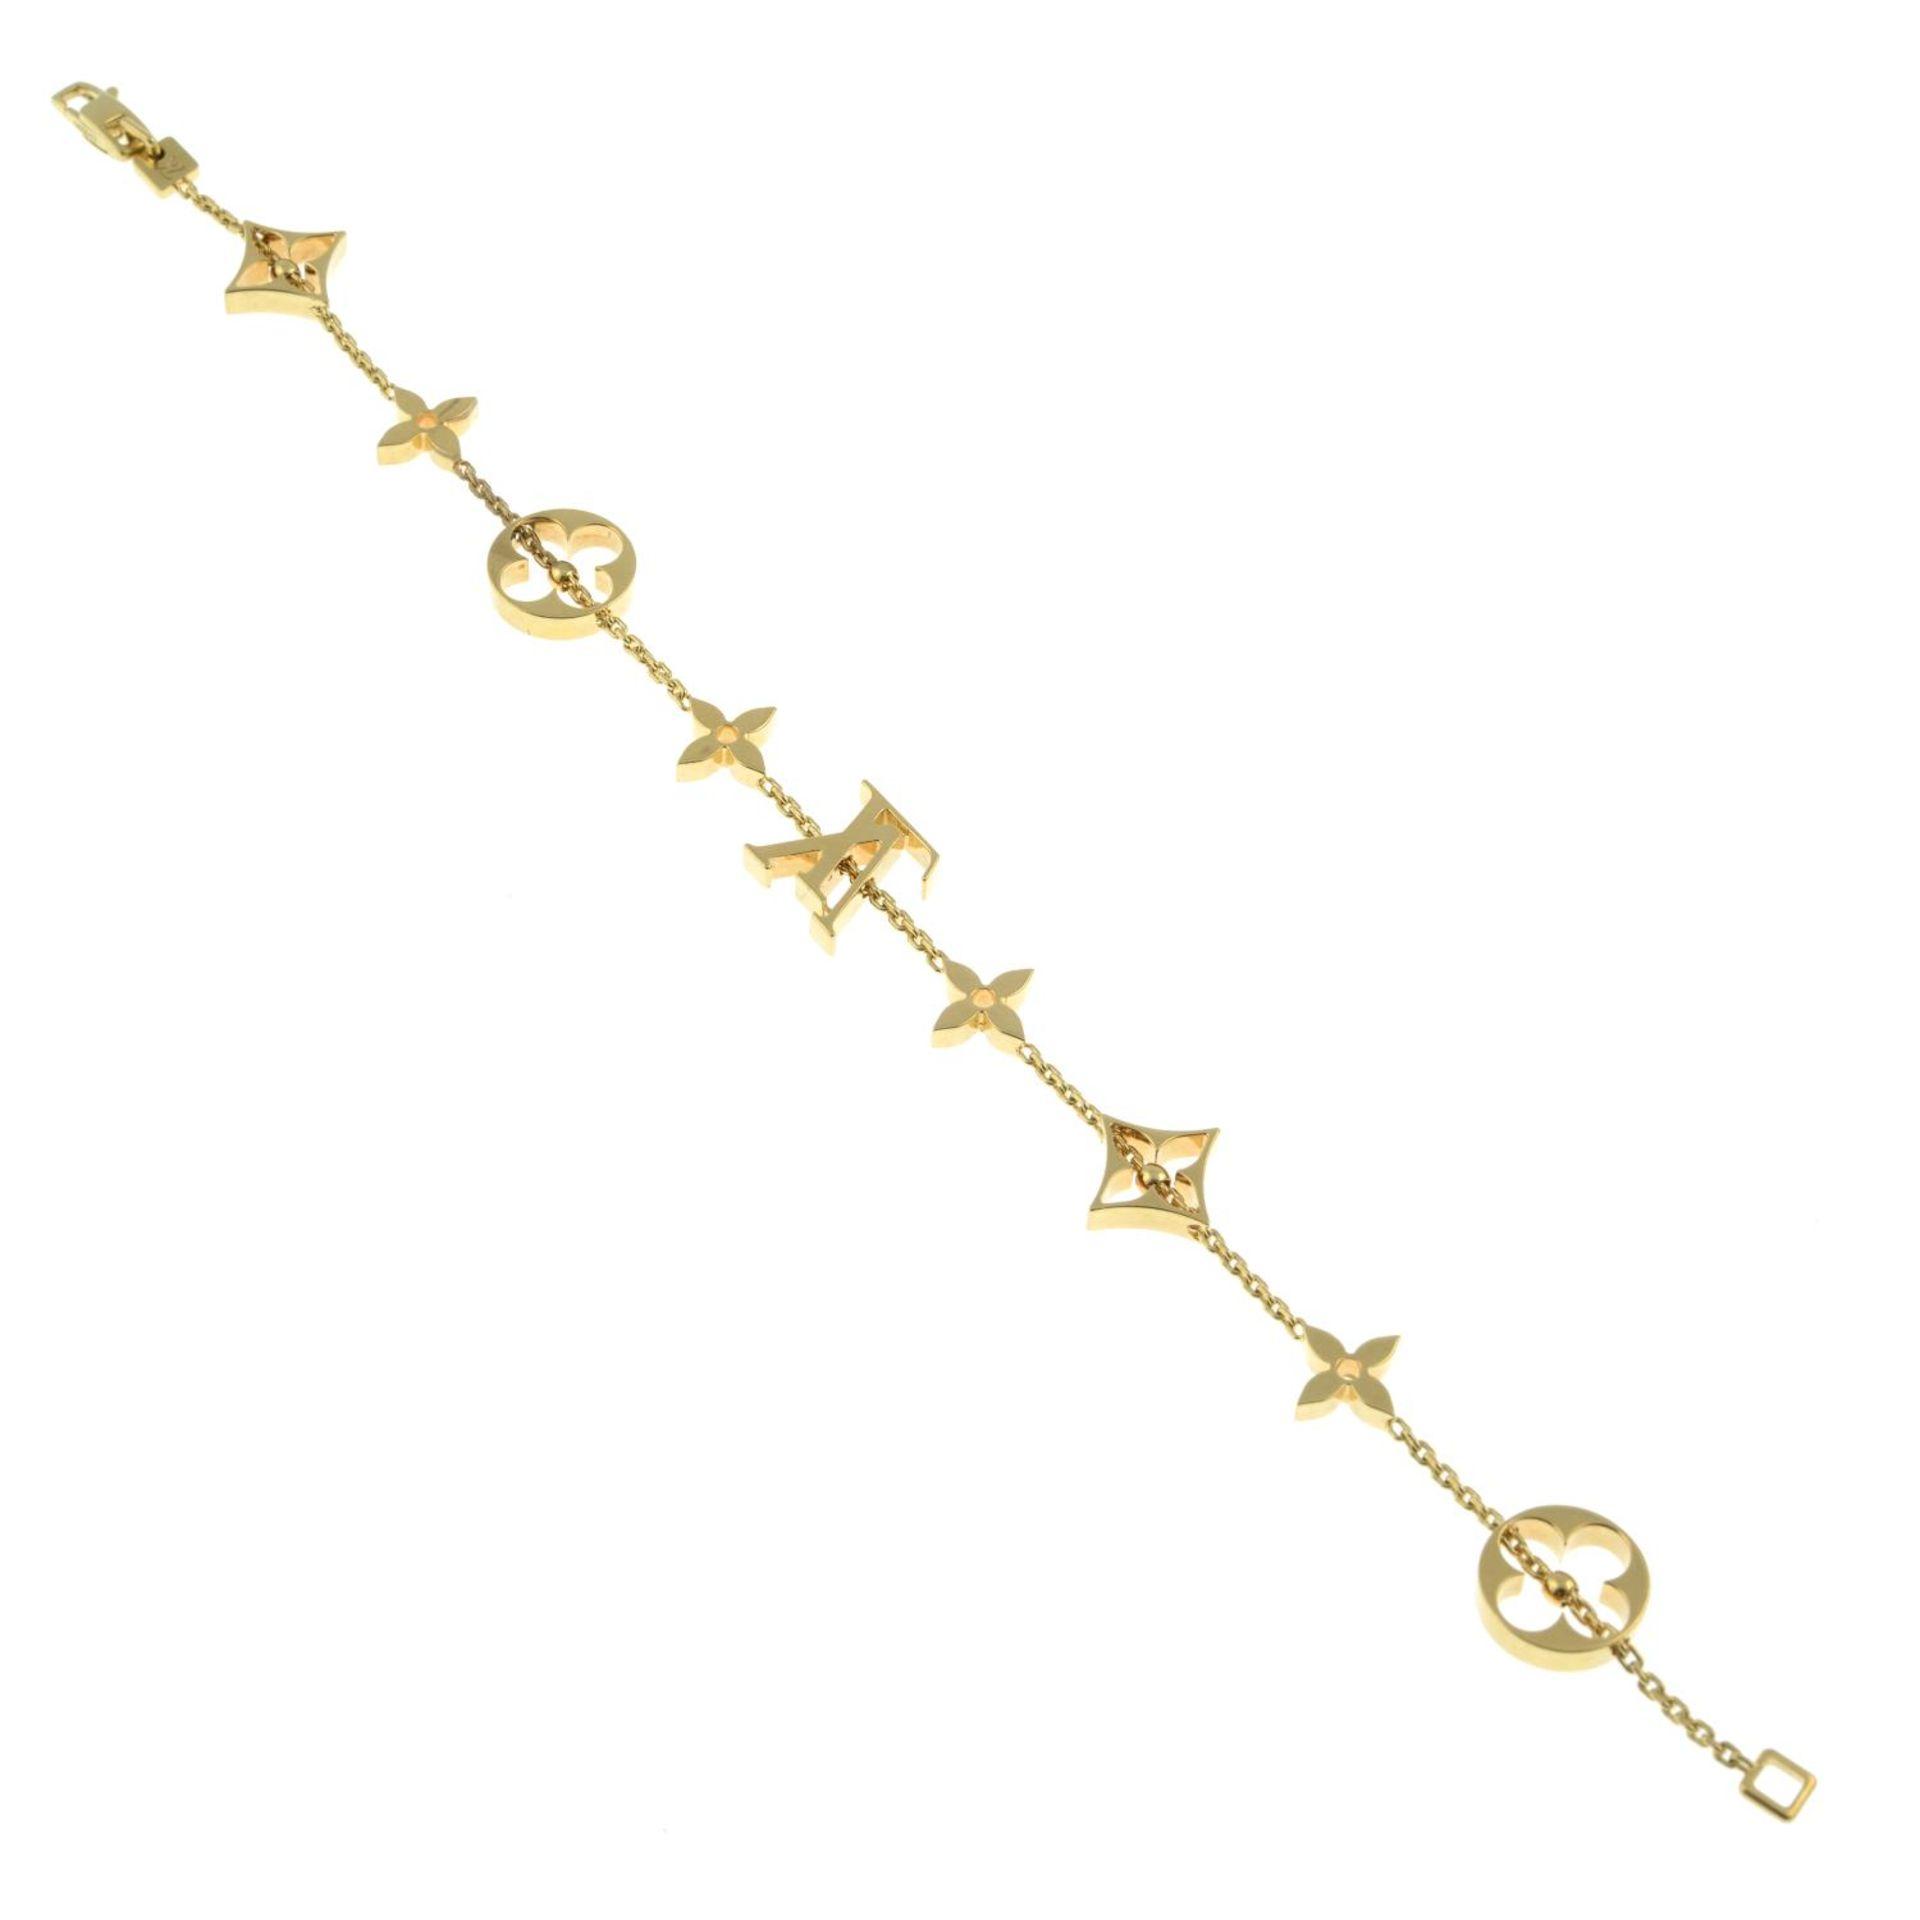 An 'Idylee Blossom Monogram' bracelet, - Image 4 of 4